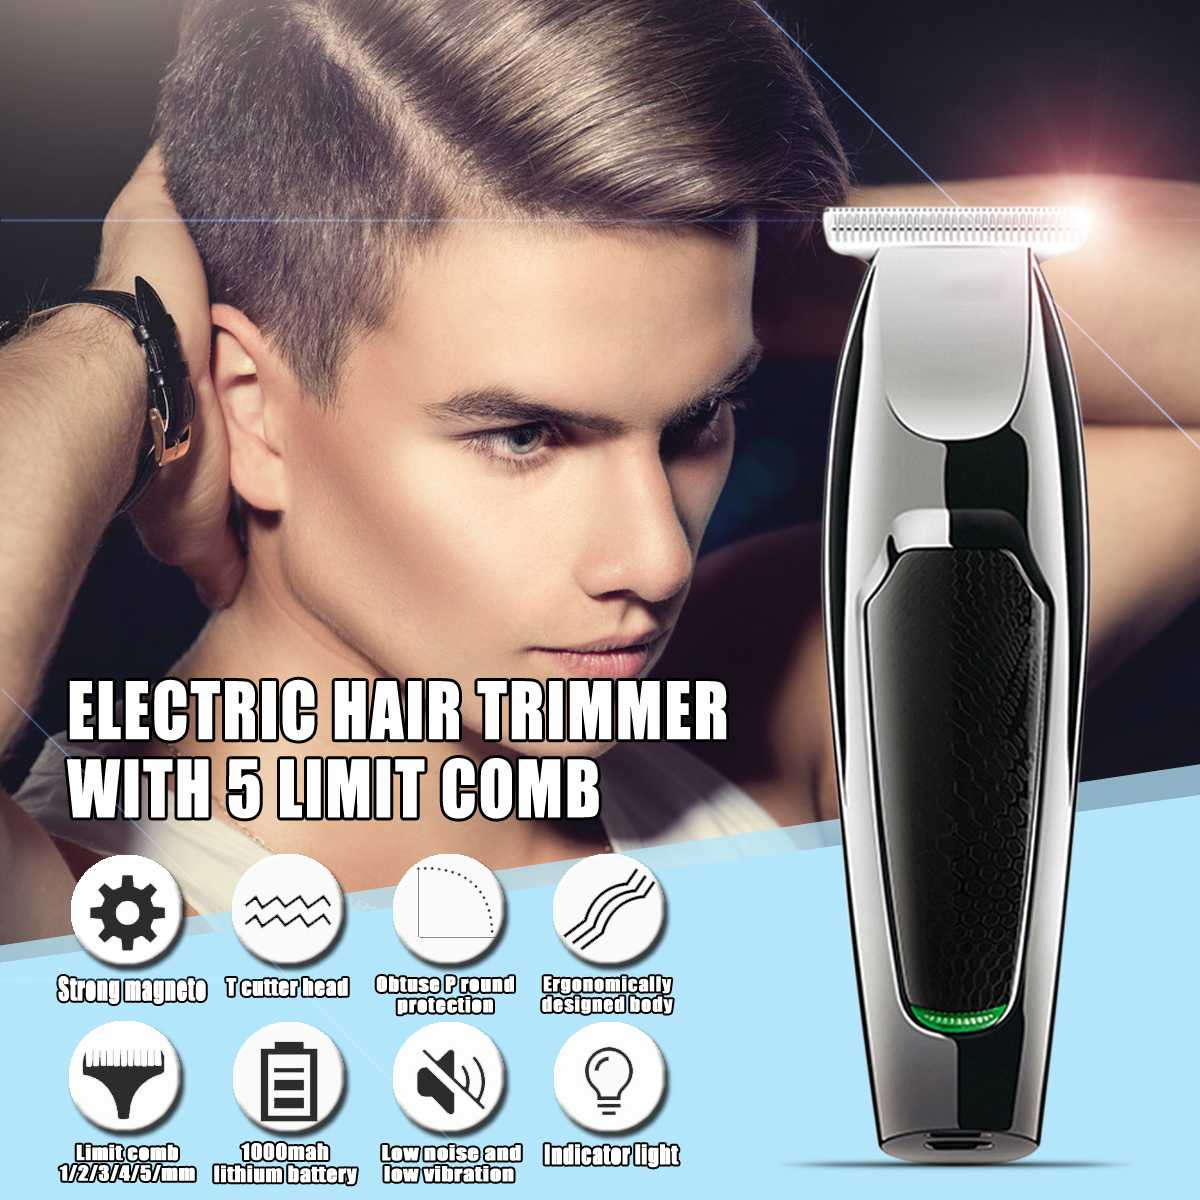 Cortadora de cabello eléctrica recargable USB con 5 límite peine mínimo pelo longitud 0,1mm pelo talla 10W